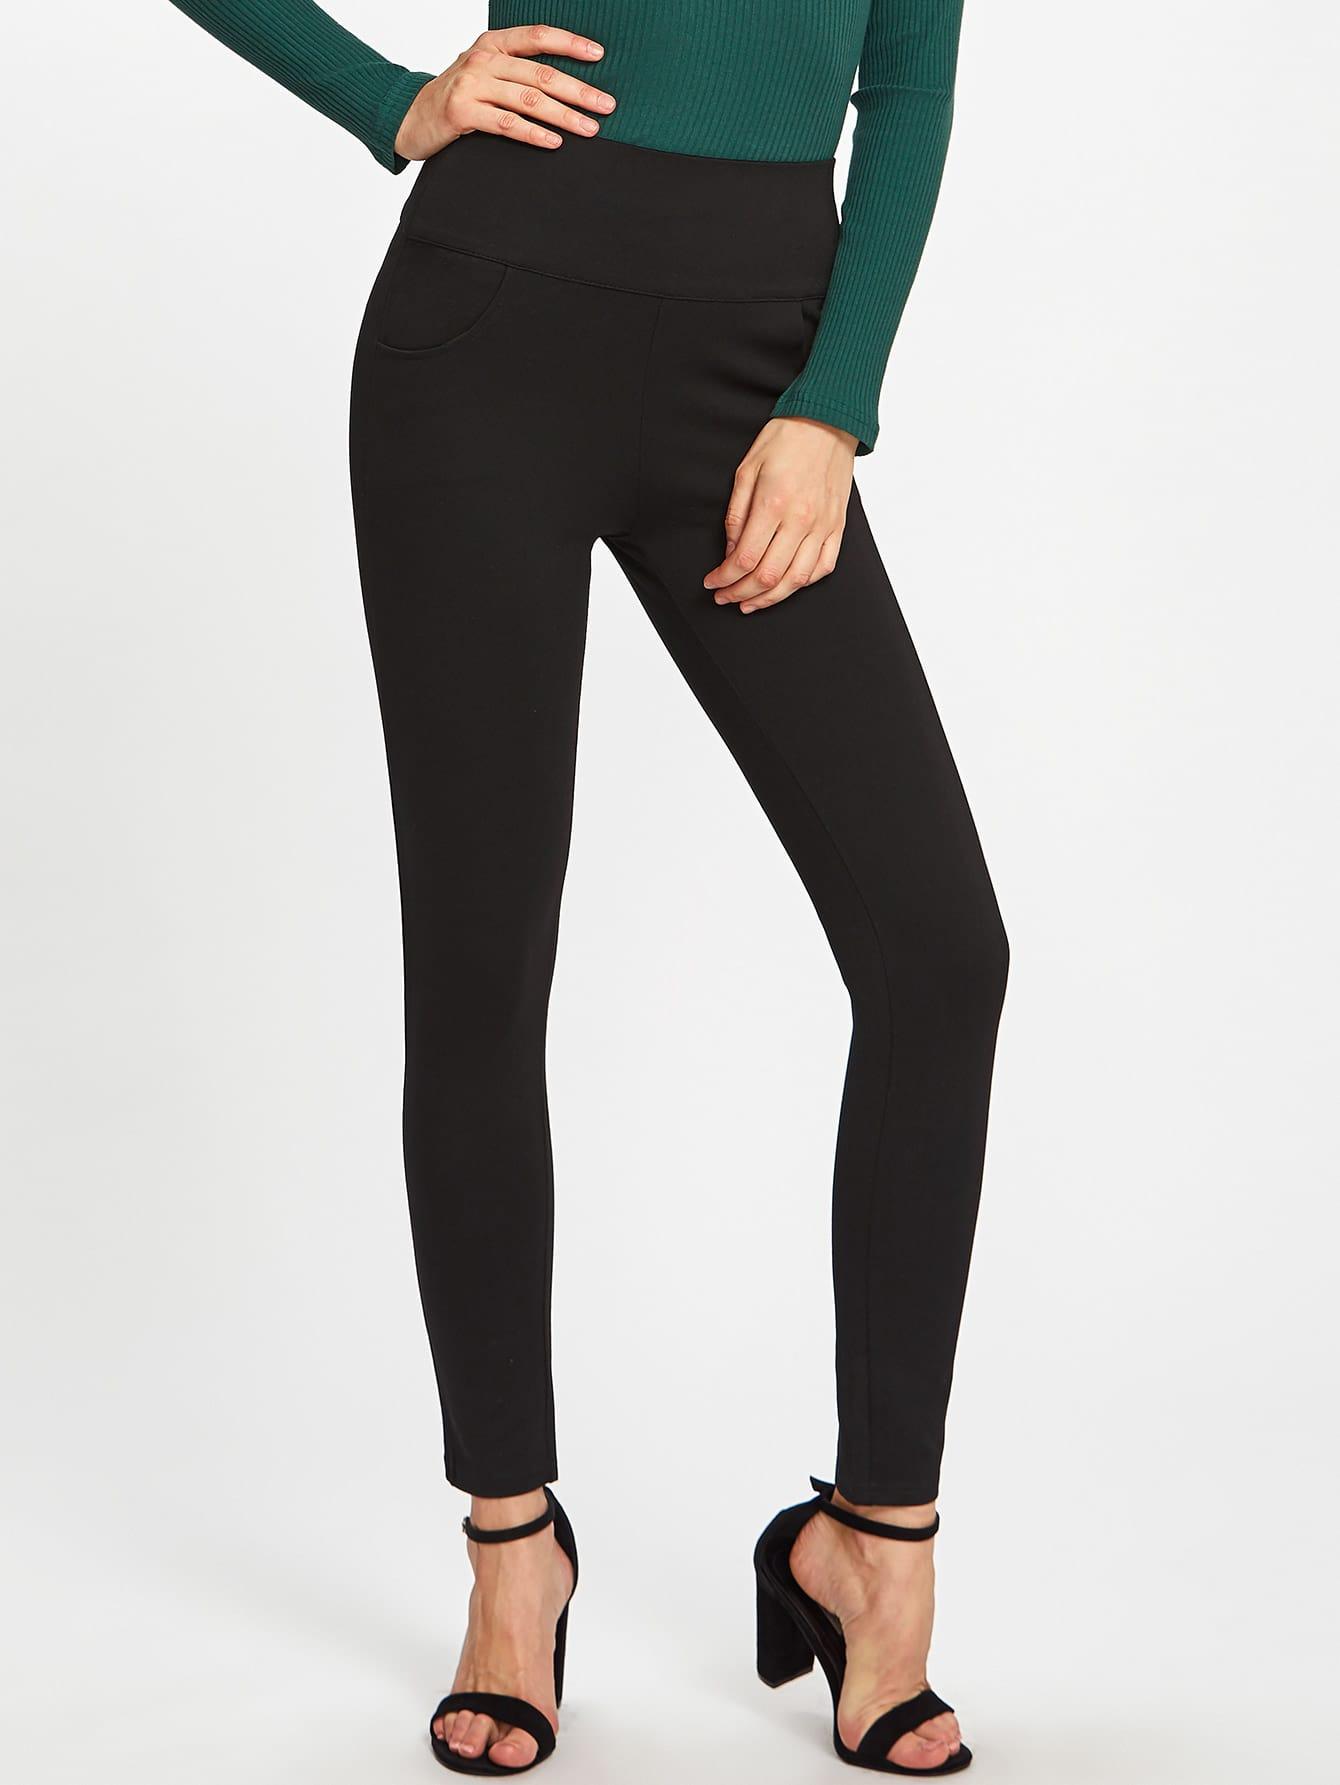 Empire Skinny Leggings original new arrival 2017 adidas pants for soccer or football con16 trg pnt men s football pants sportswear